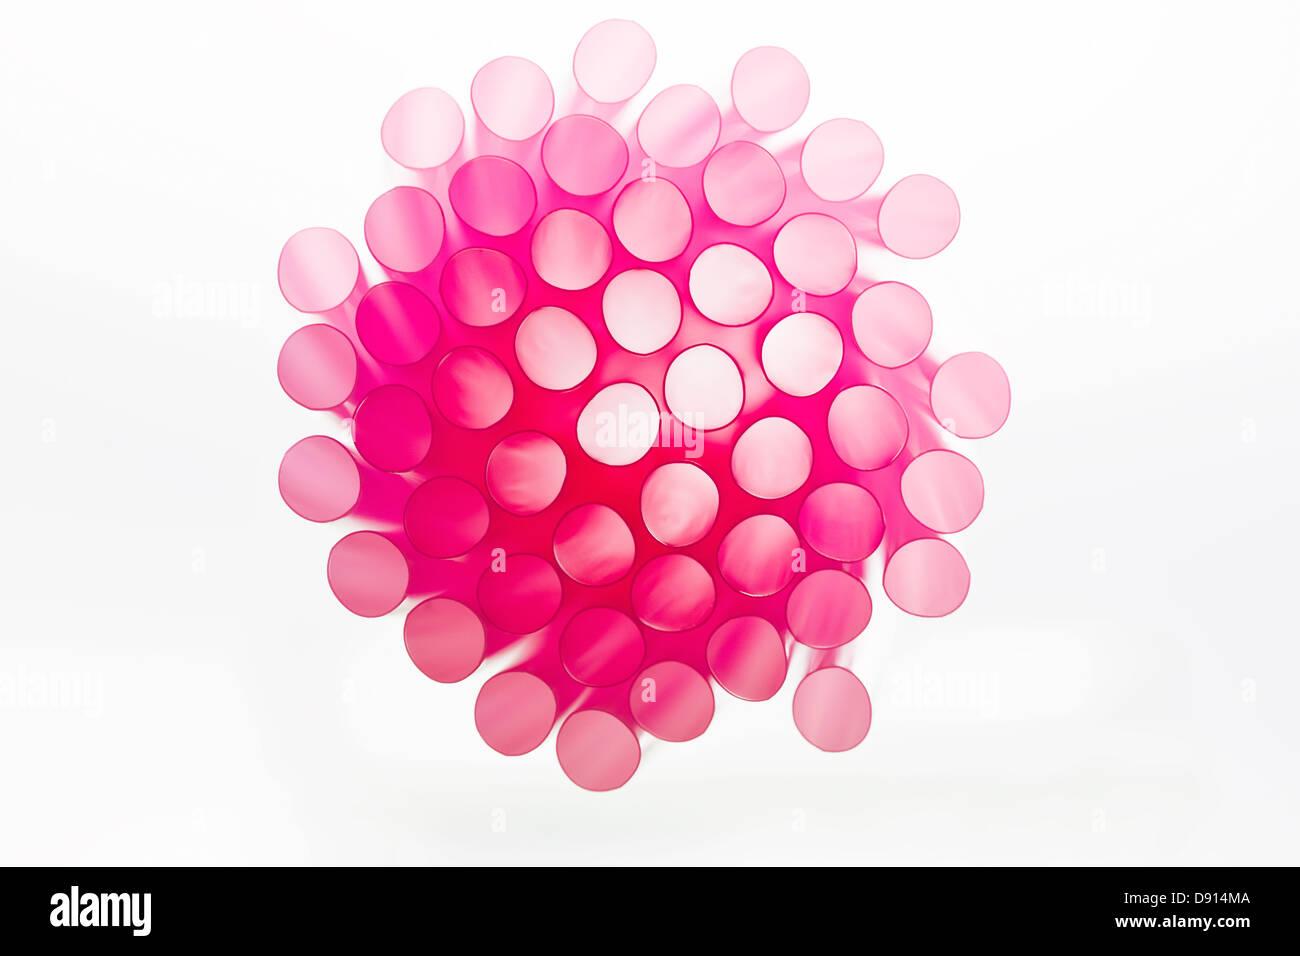 Studio shot of pink drinking straws - Stock Image